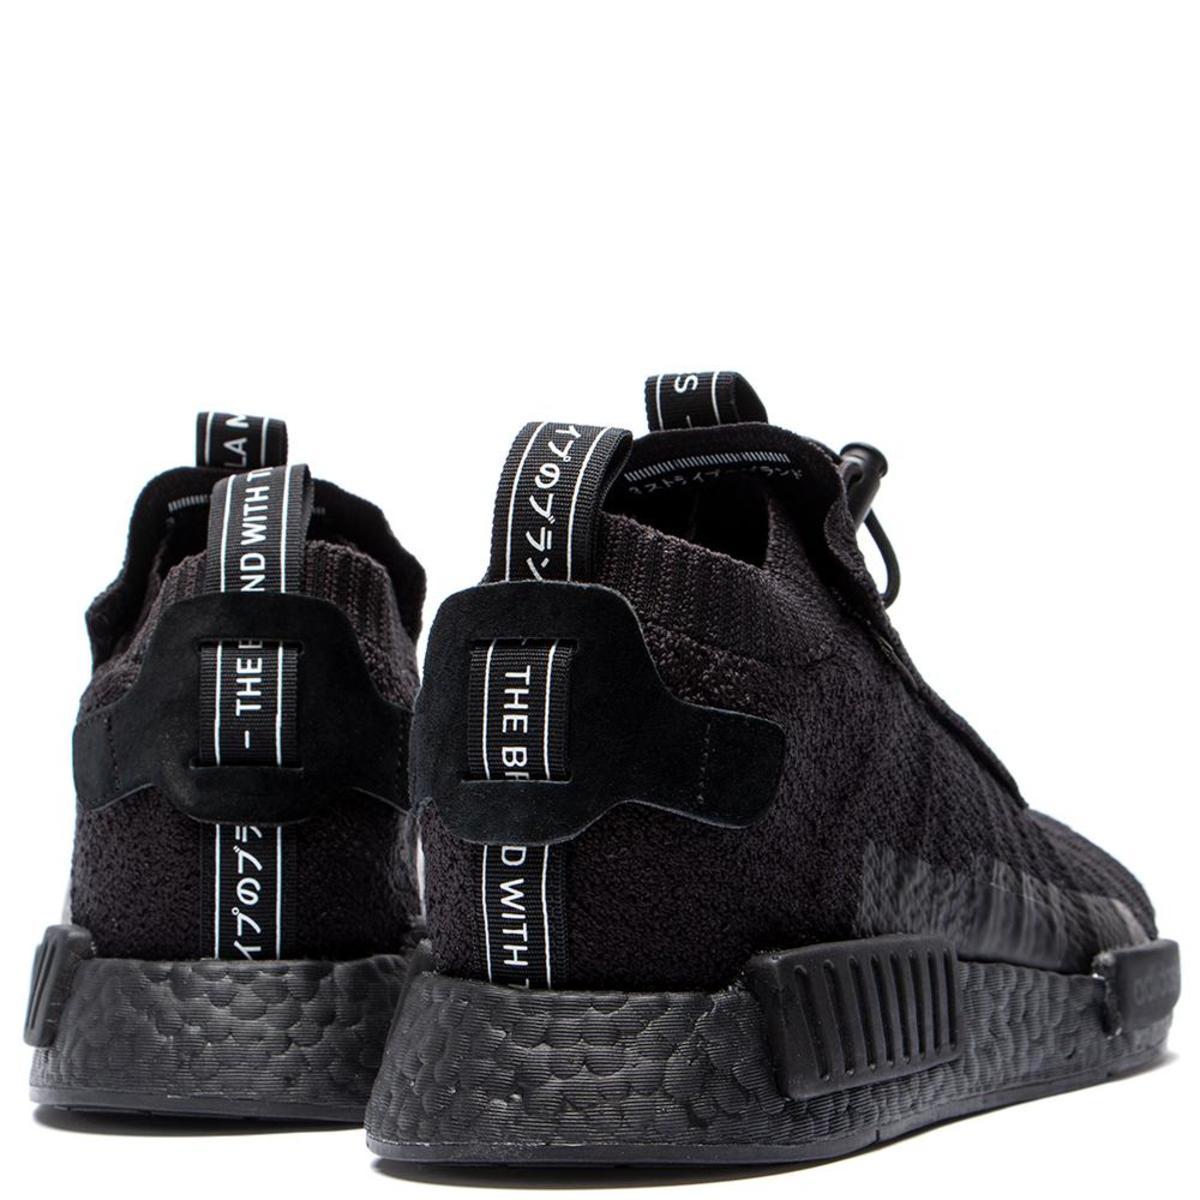 1d201da774bce8 adidas NMD TS1 Primeknit Gore-Tex   Core Black